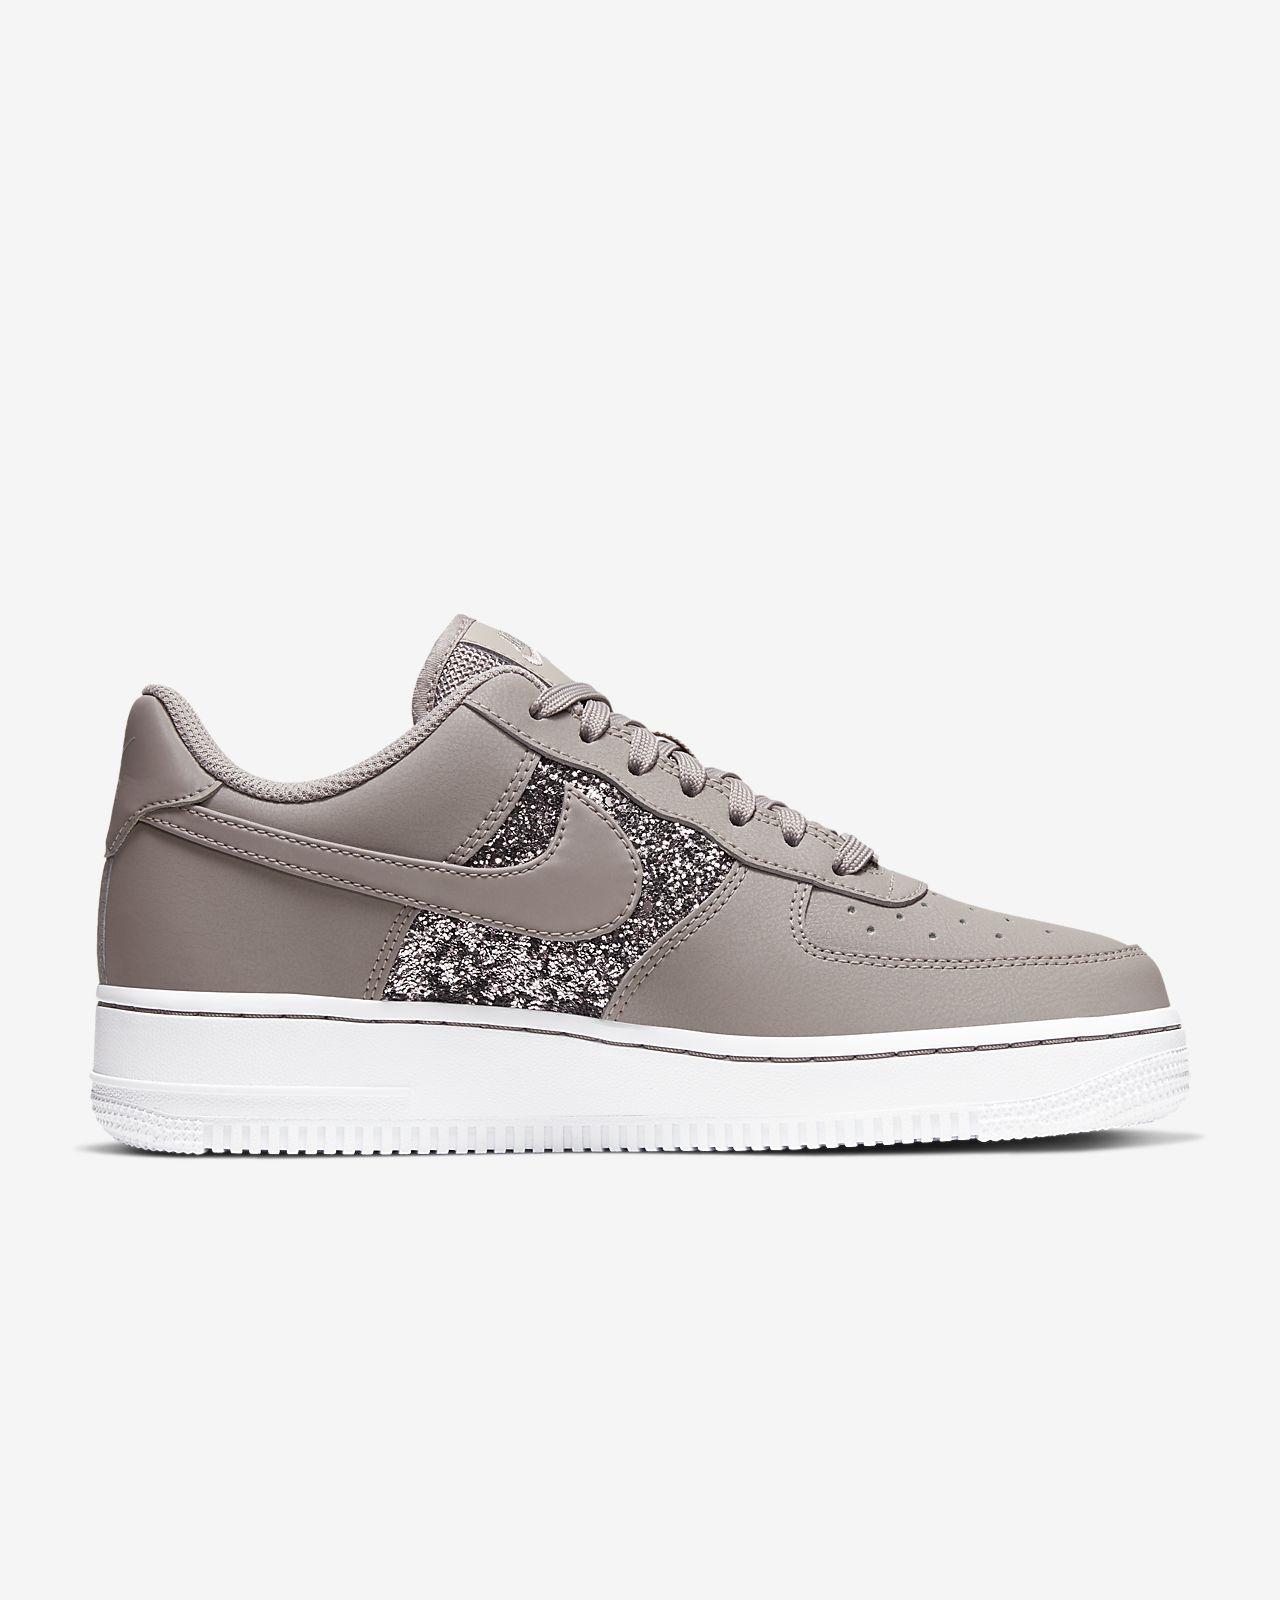 Nike Air Force 1 Low Damesschoen met glitter